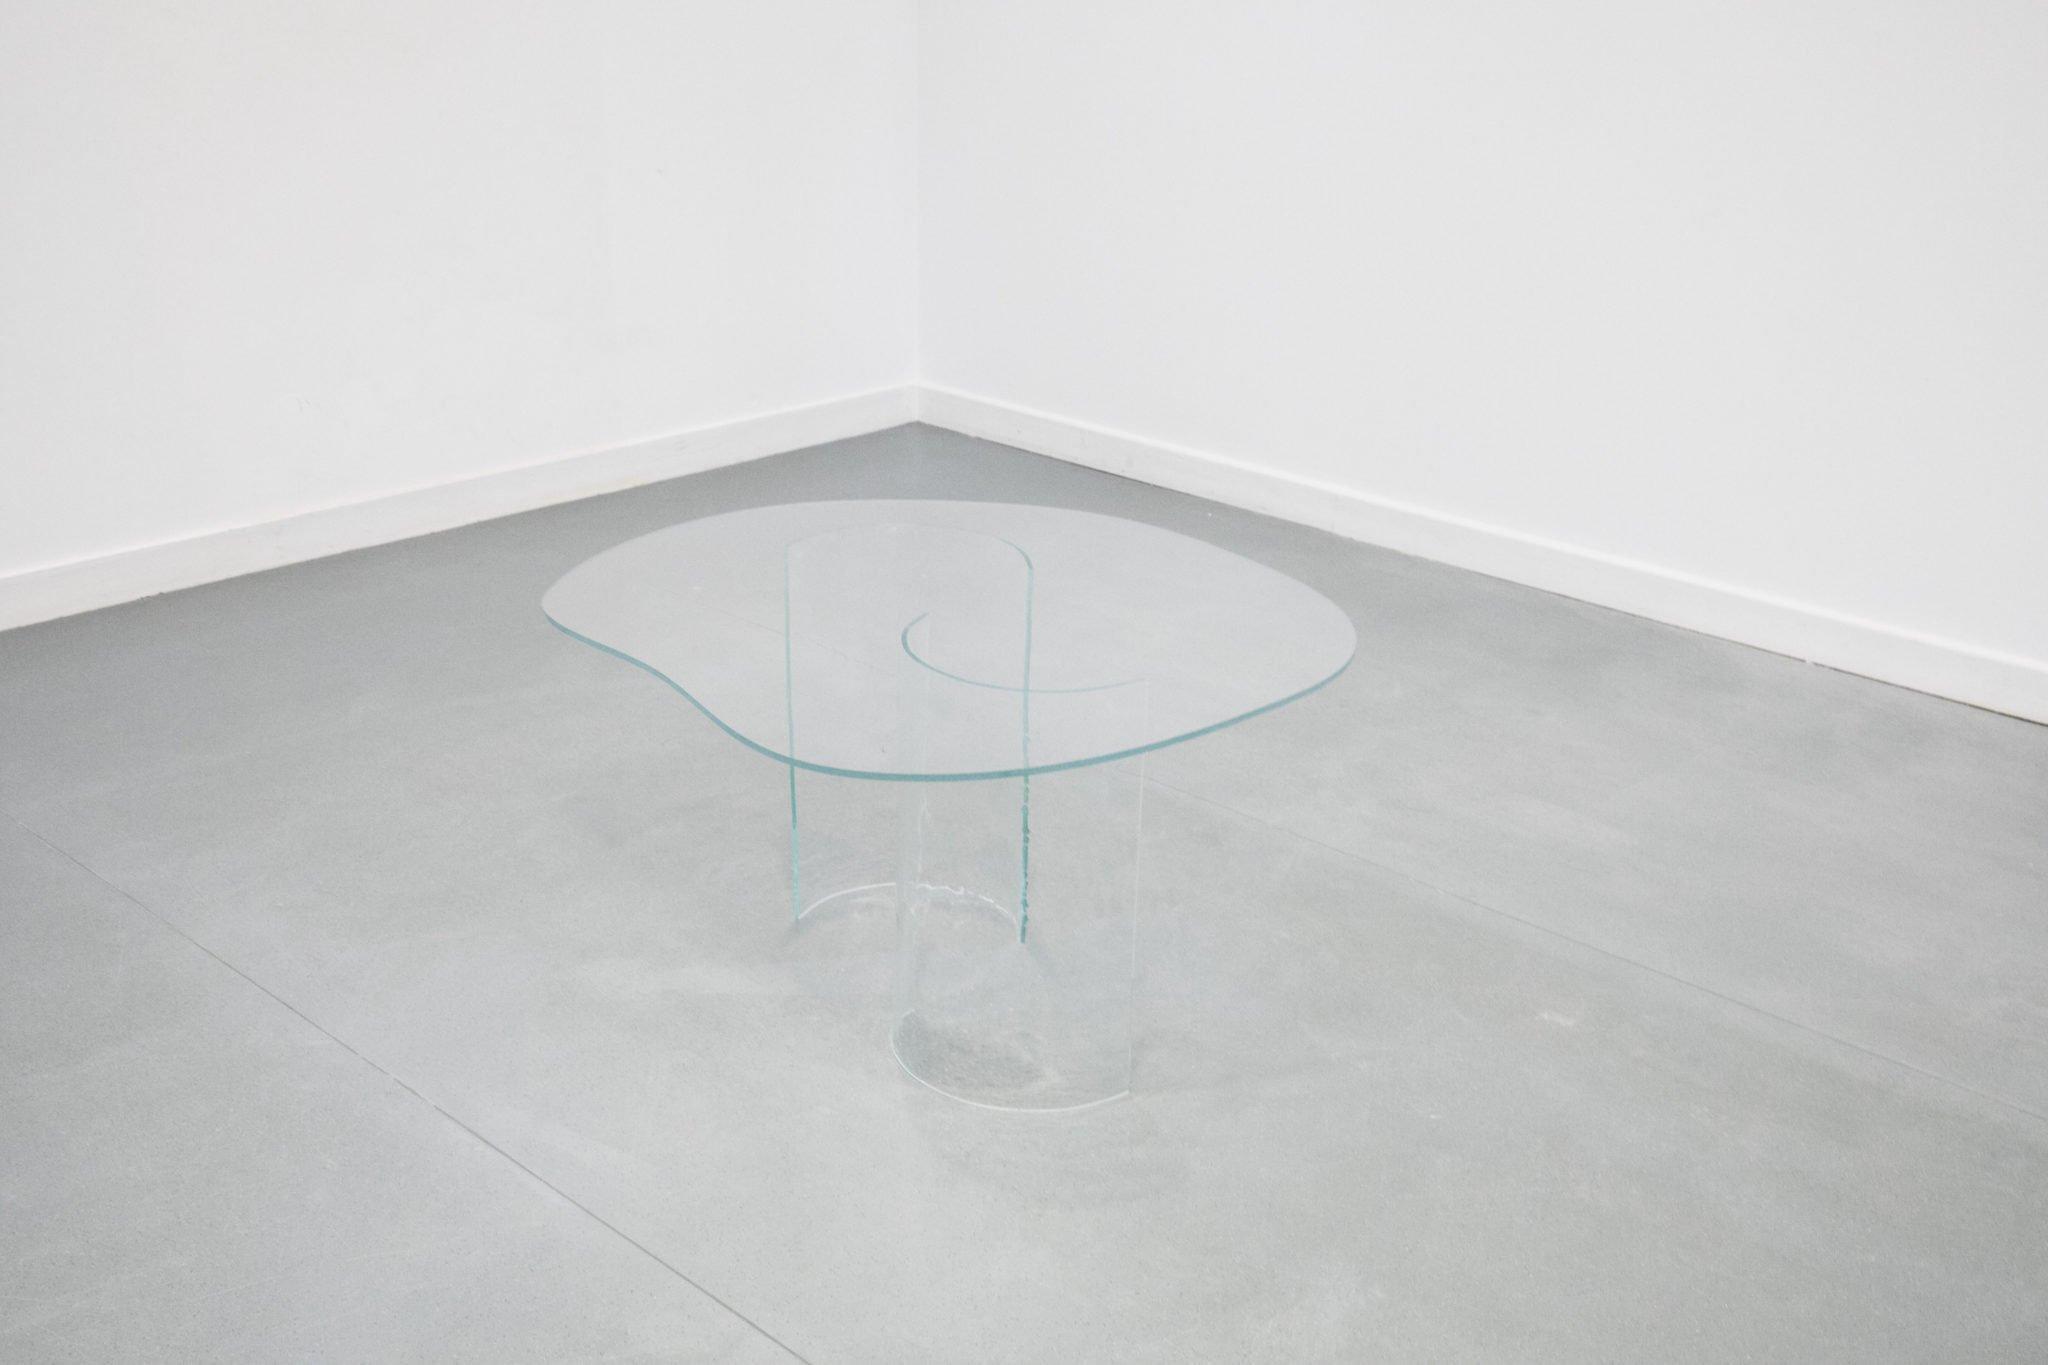 Table full transparente 1.1